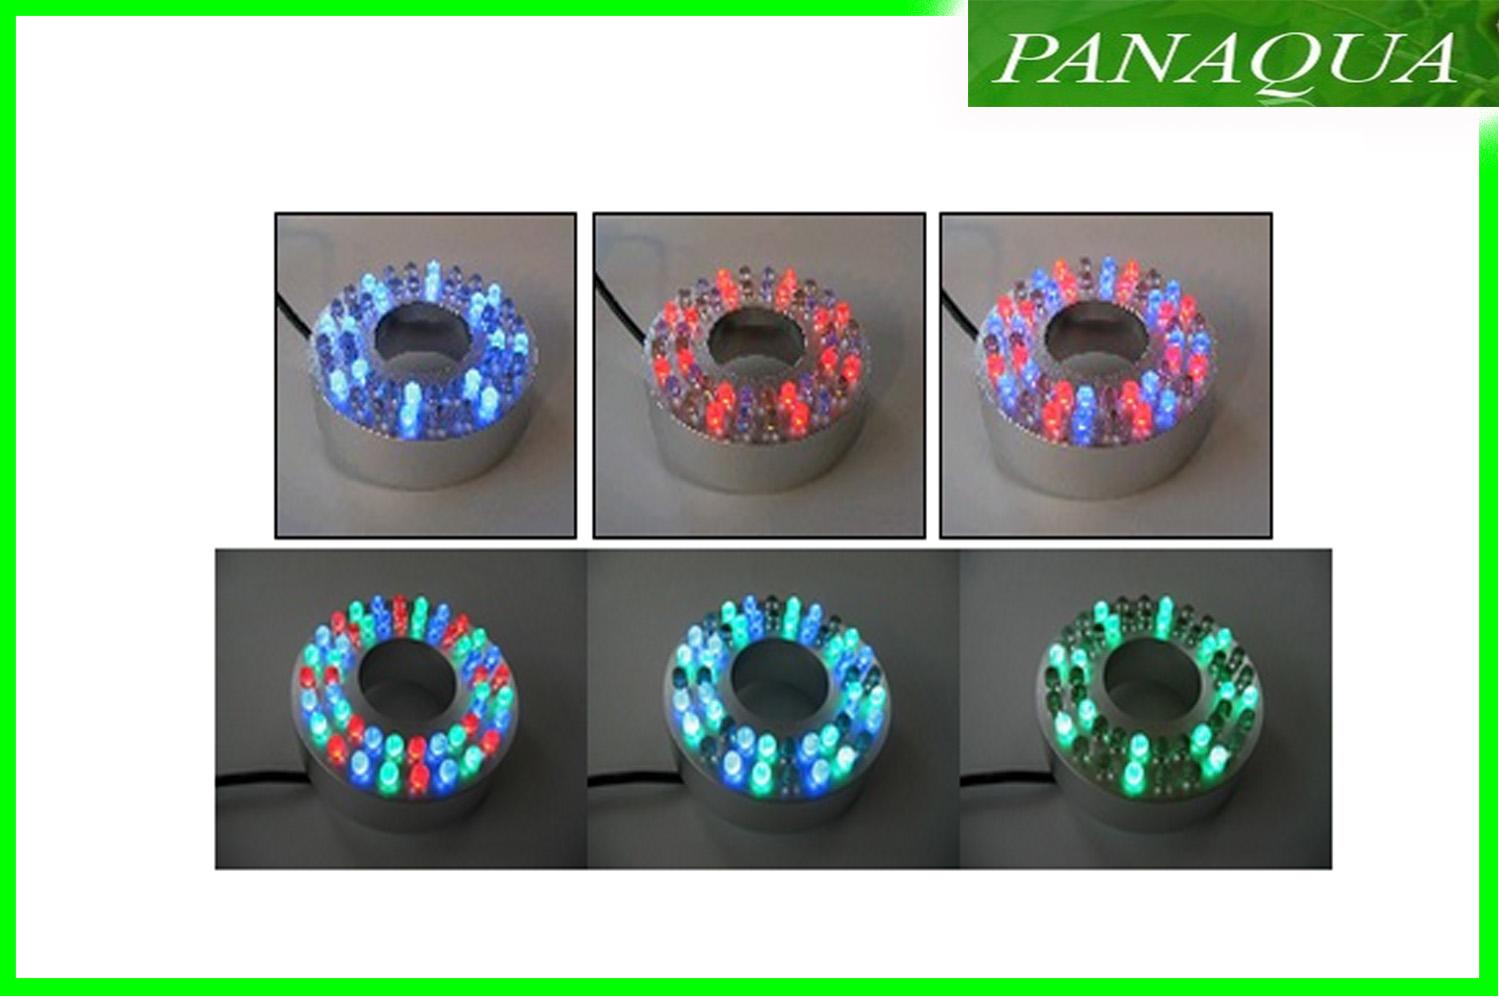 Ring 48 Led Rbg Kolor Podświetlenie Fontann 3w Panaquaeu